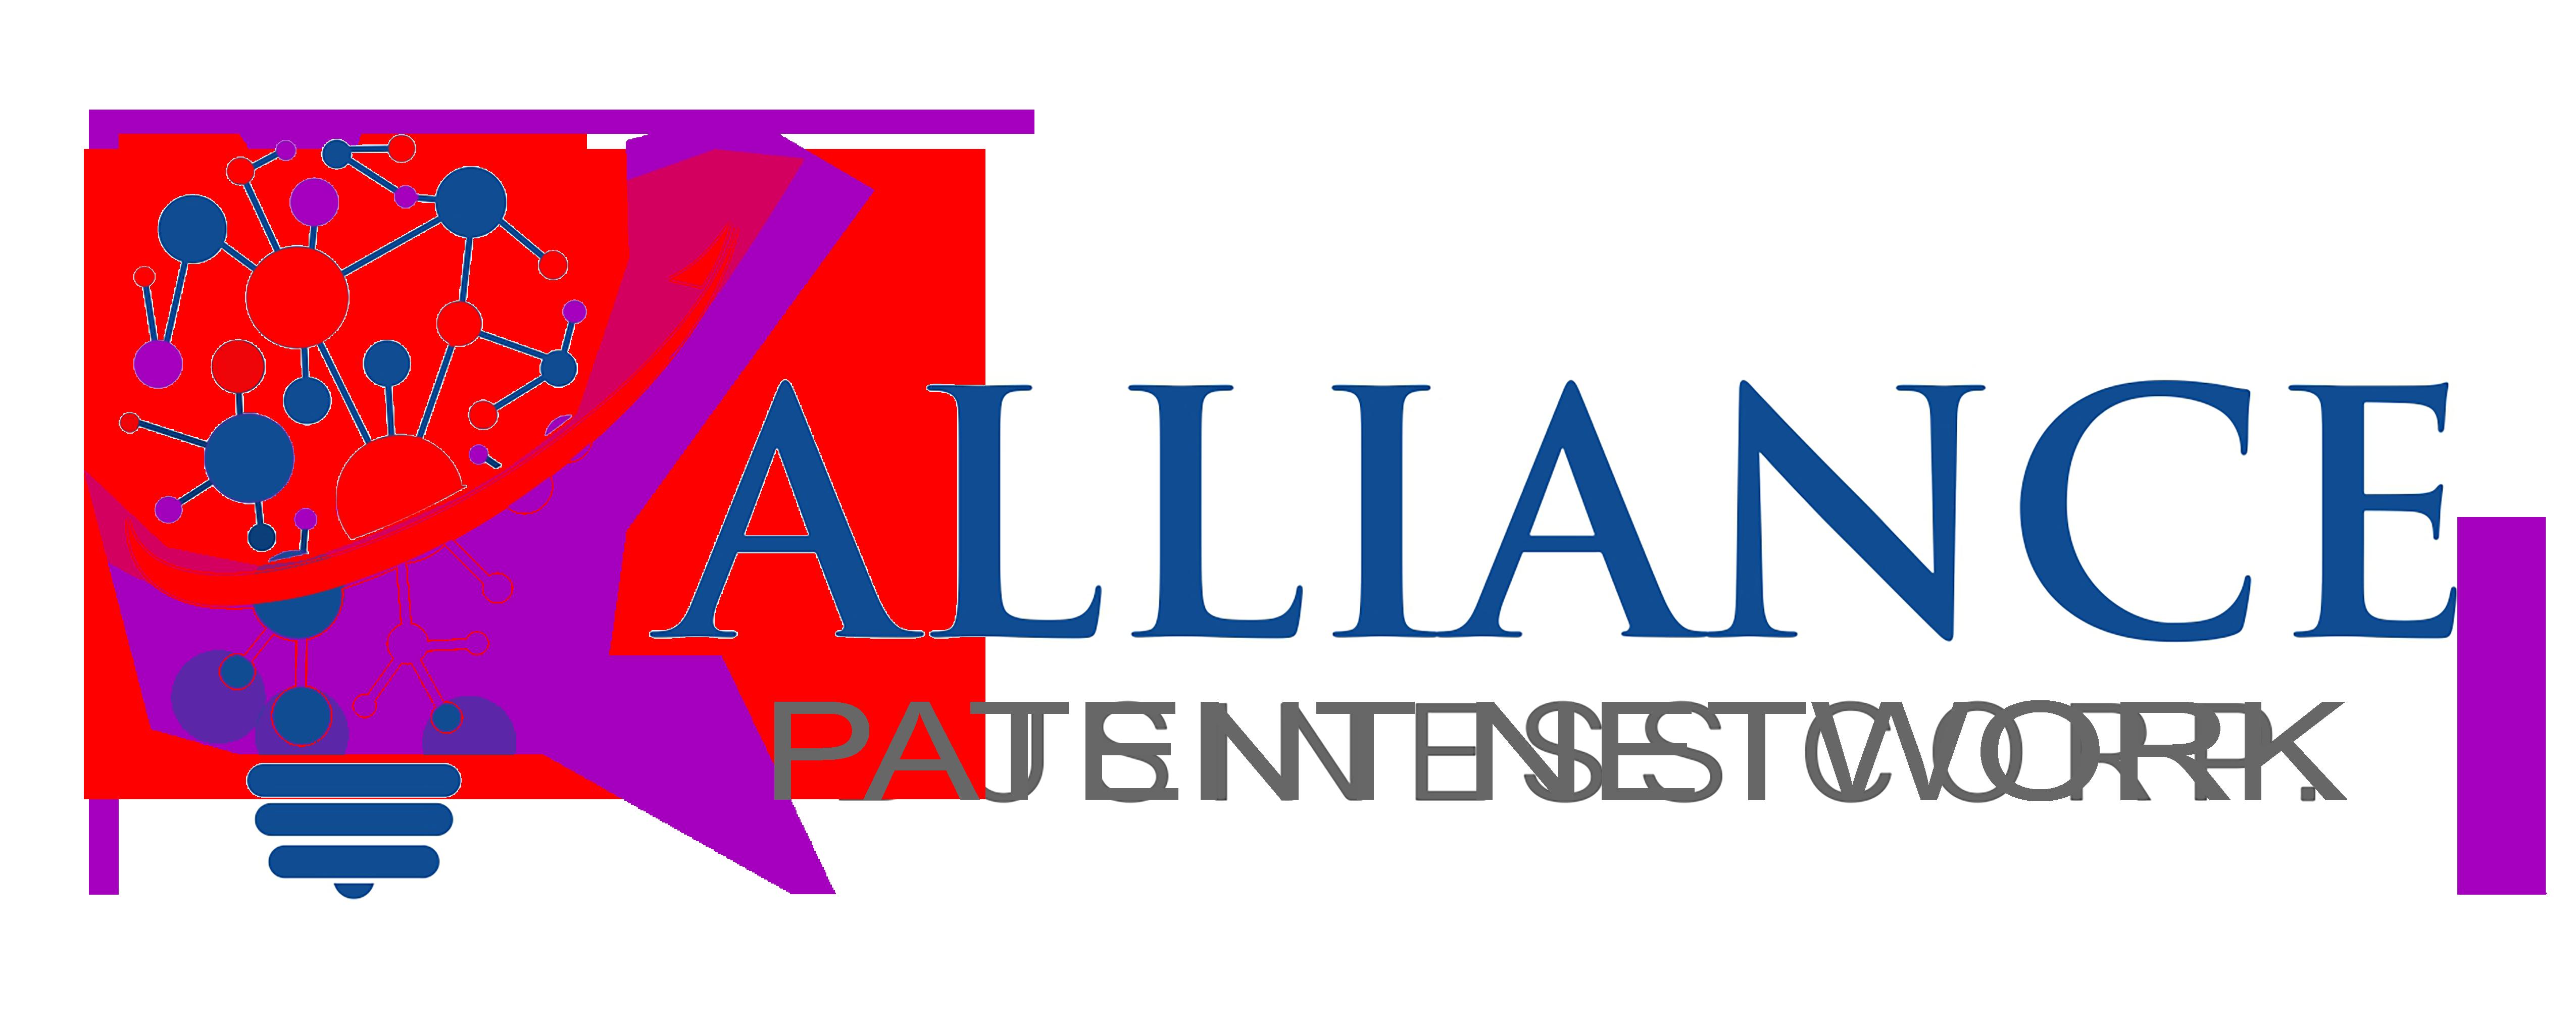 patent my idea |